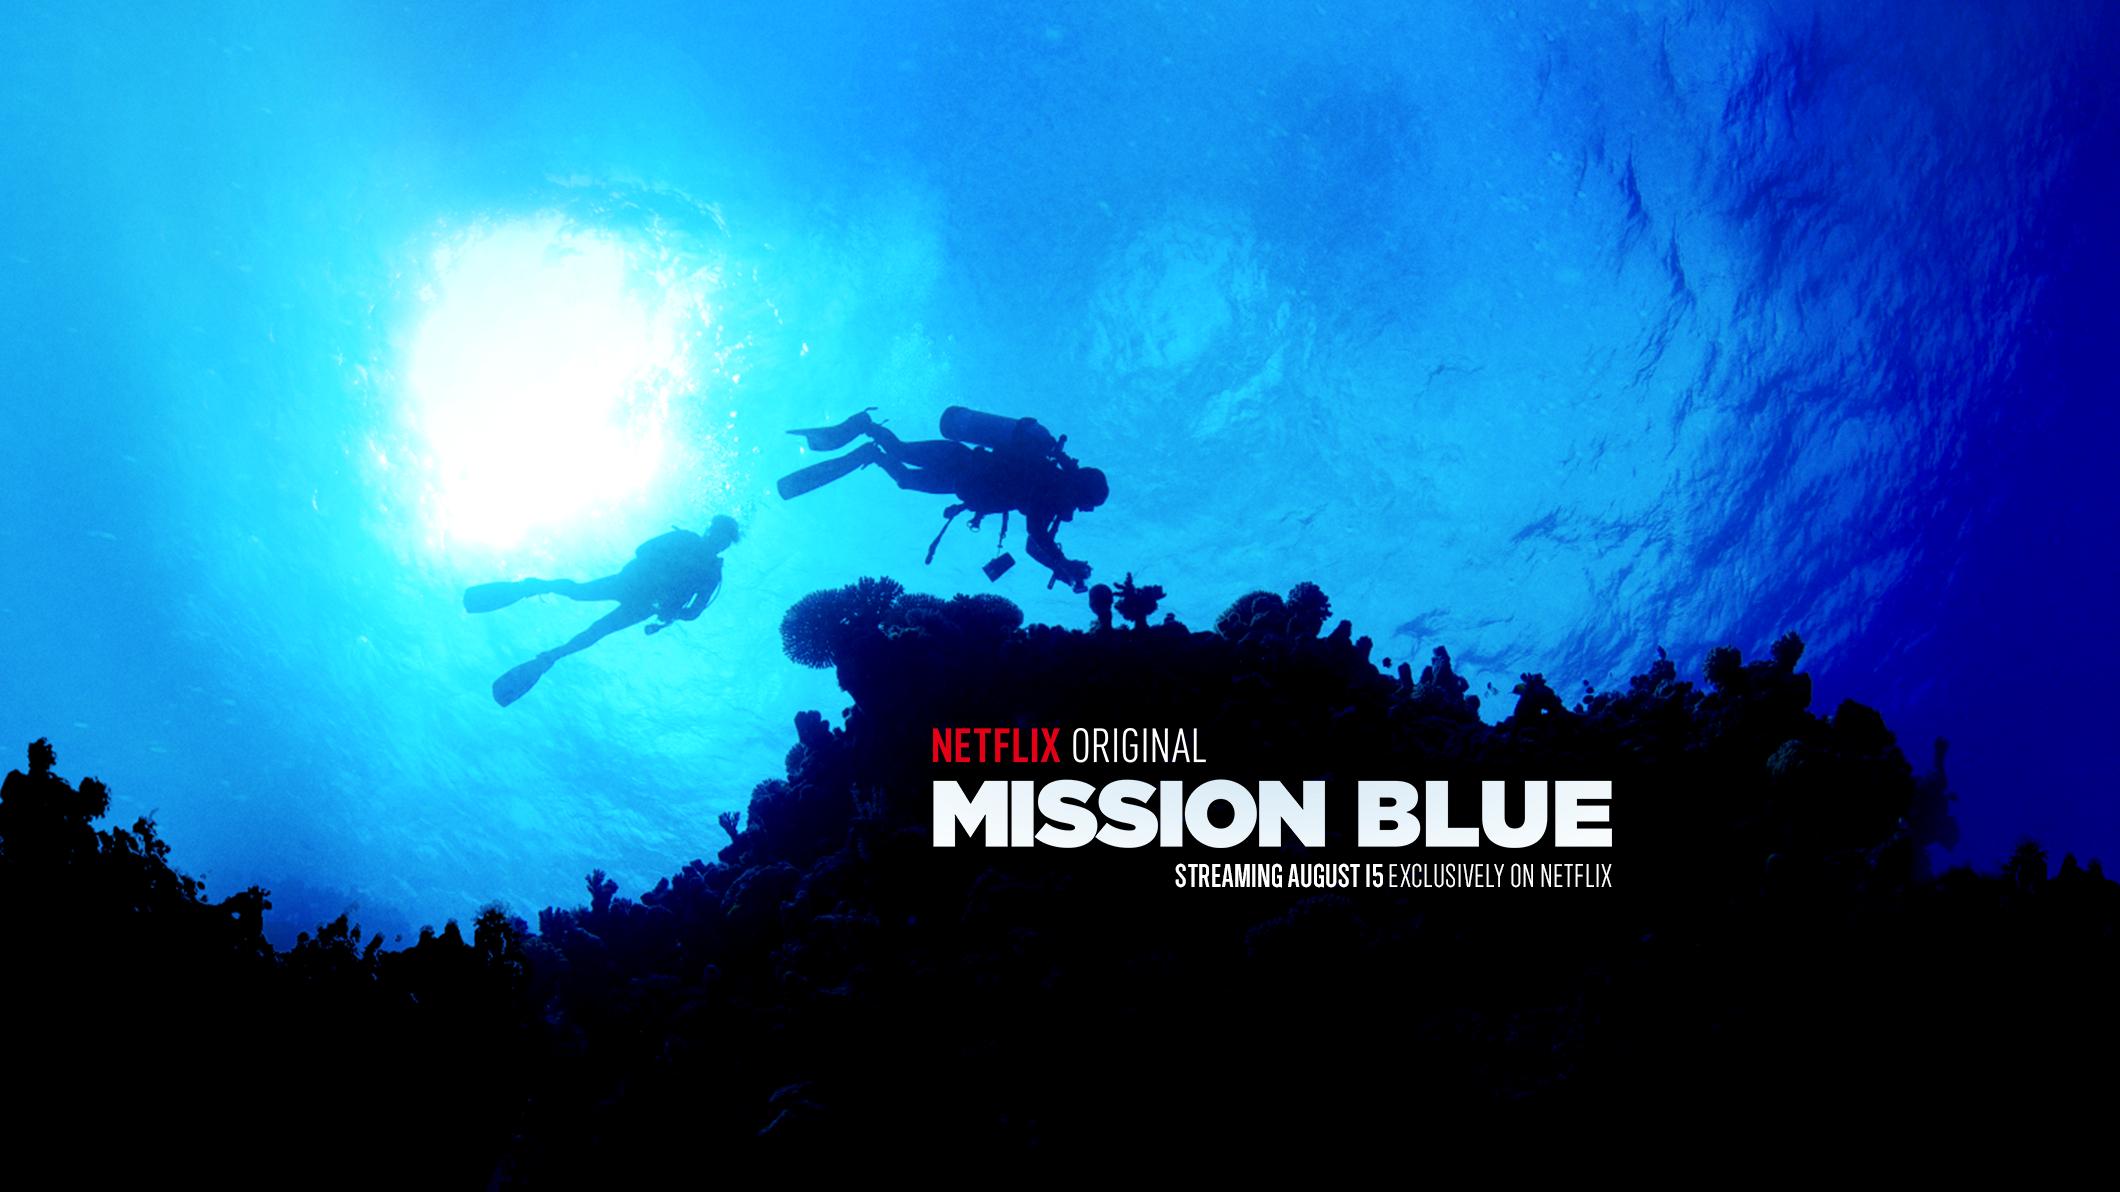 mission-blue_netflix-2